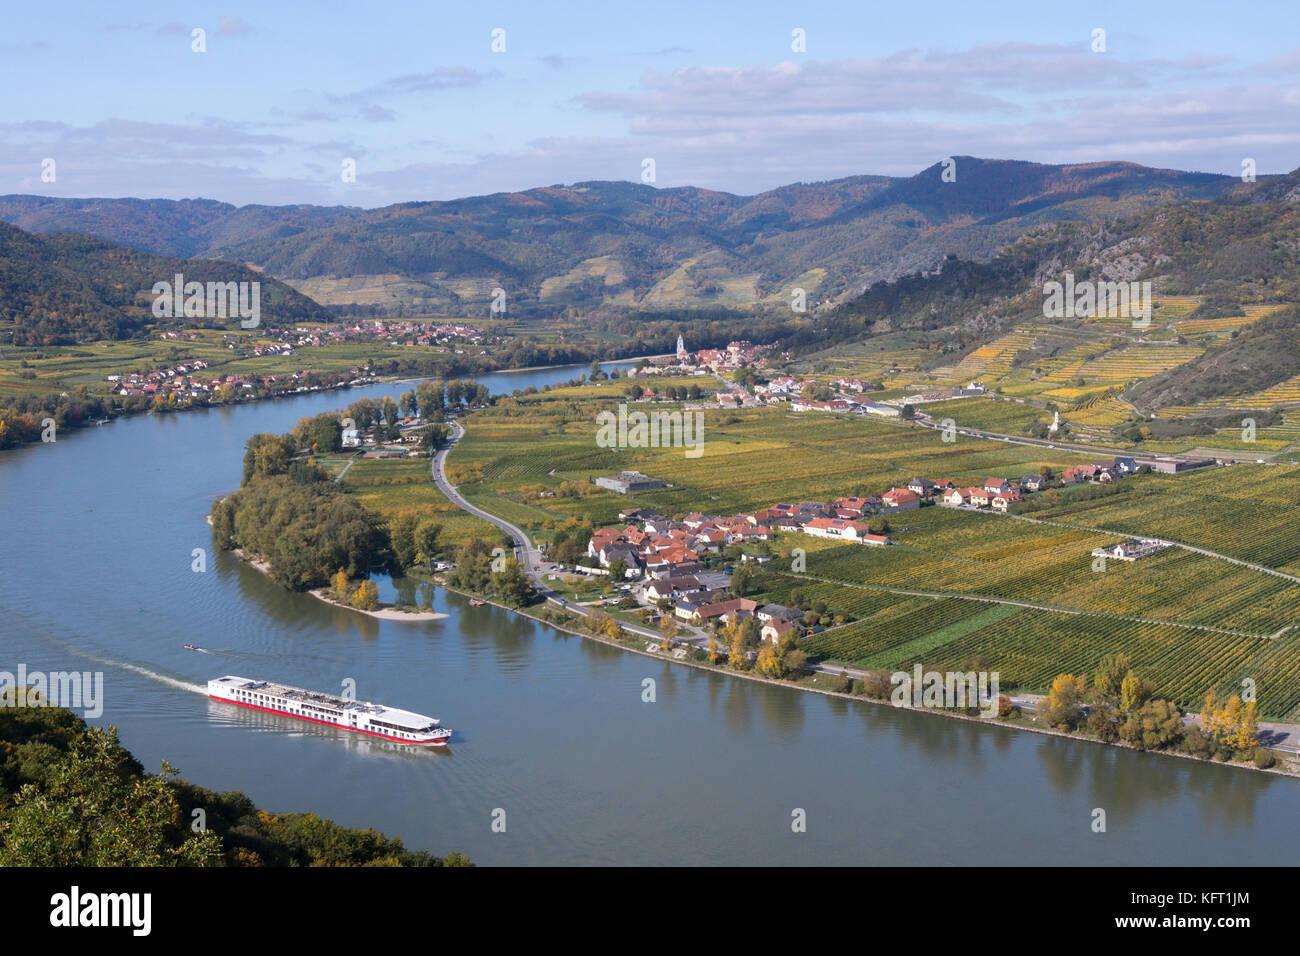 a-cruiseship-passes-drnstein-on-the-danu